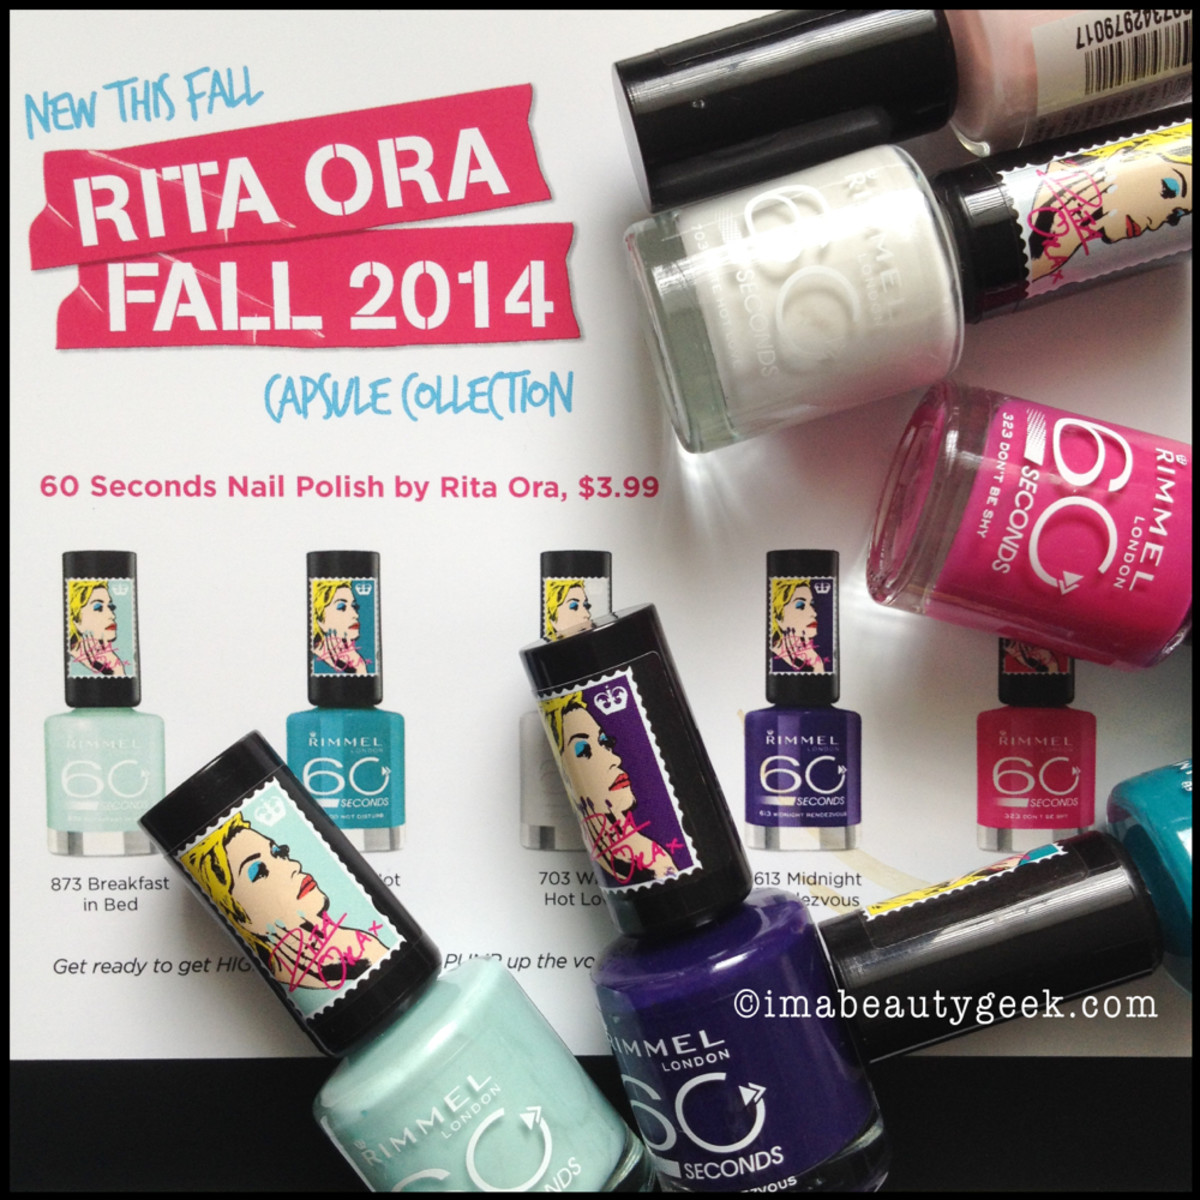 Rimmel Rita Ora fall 2014